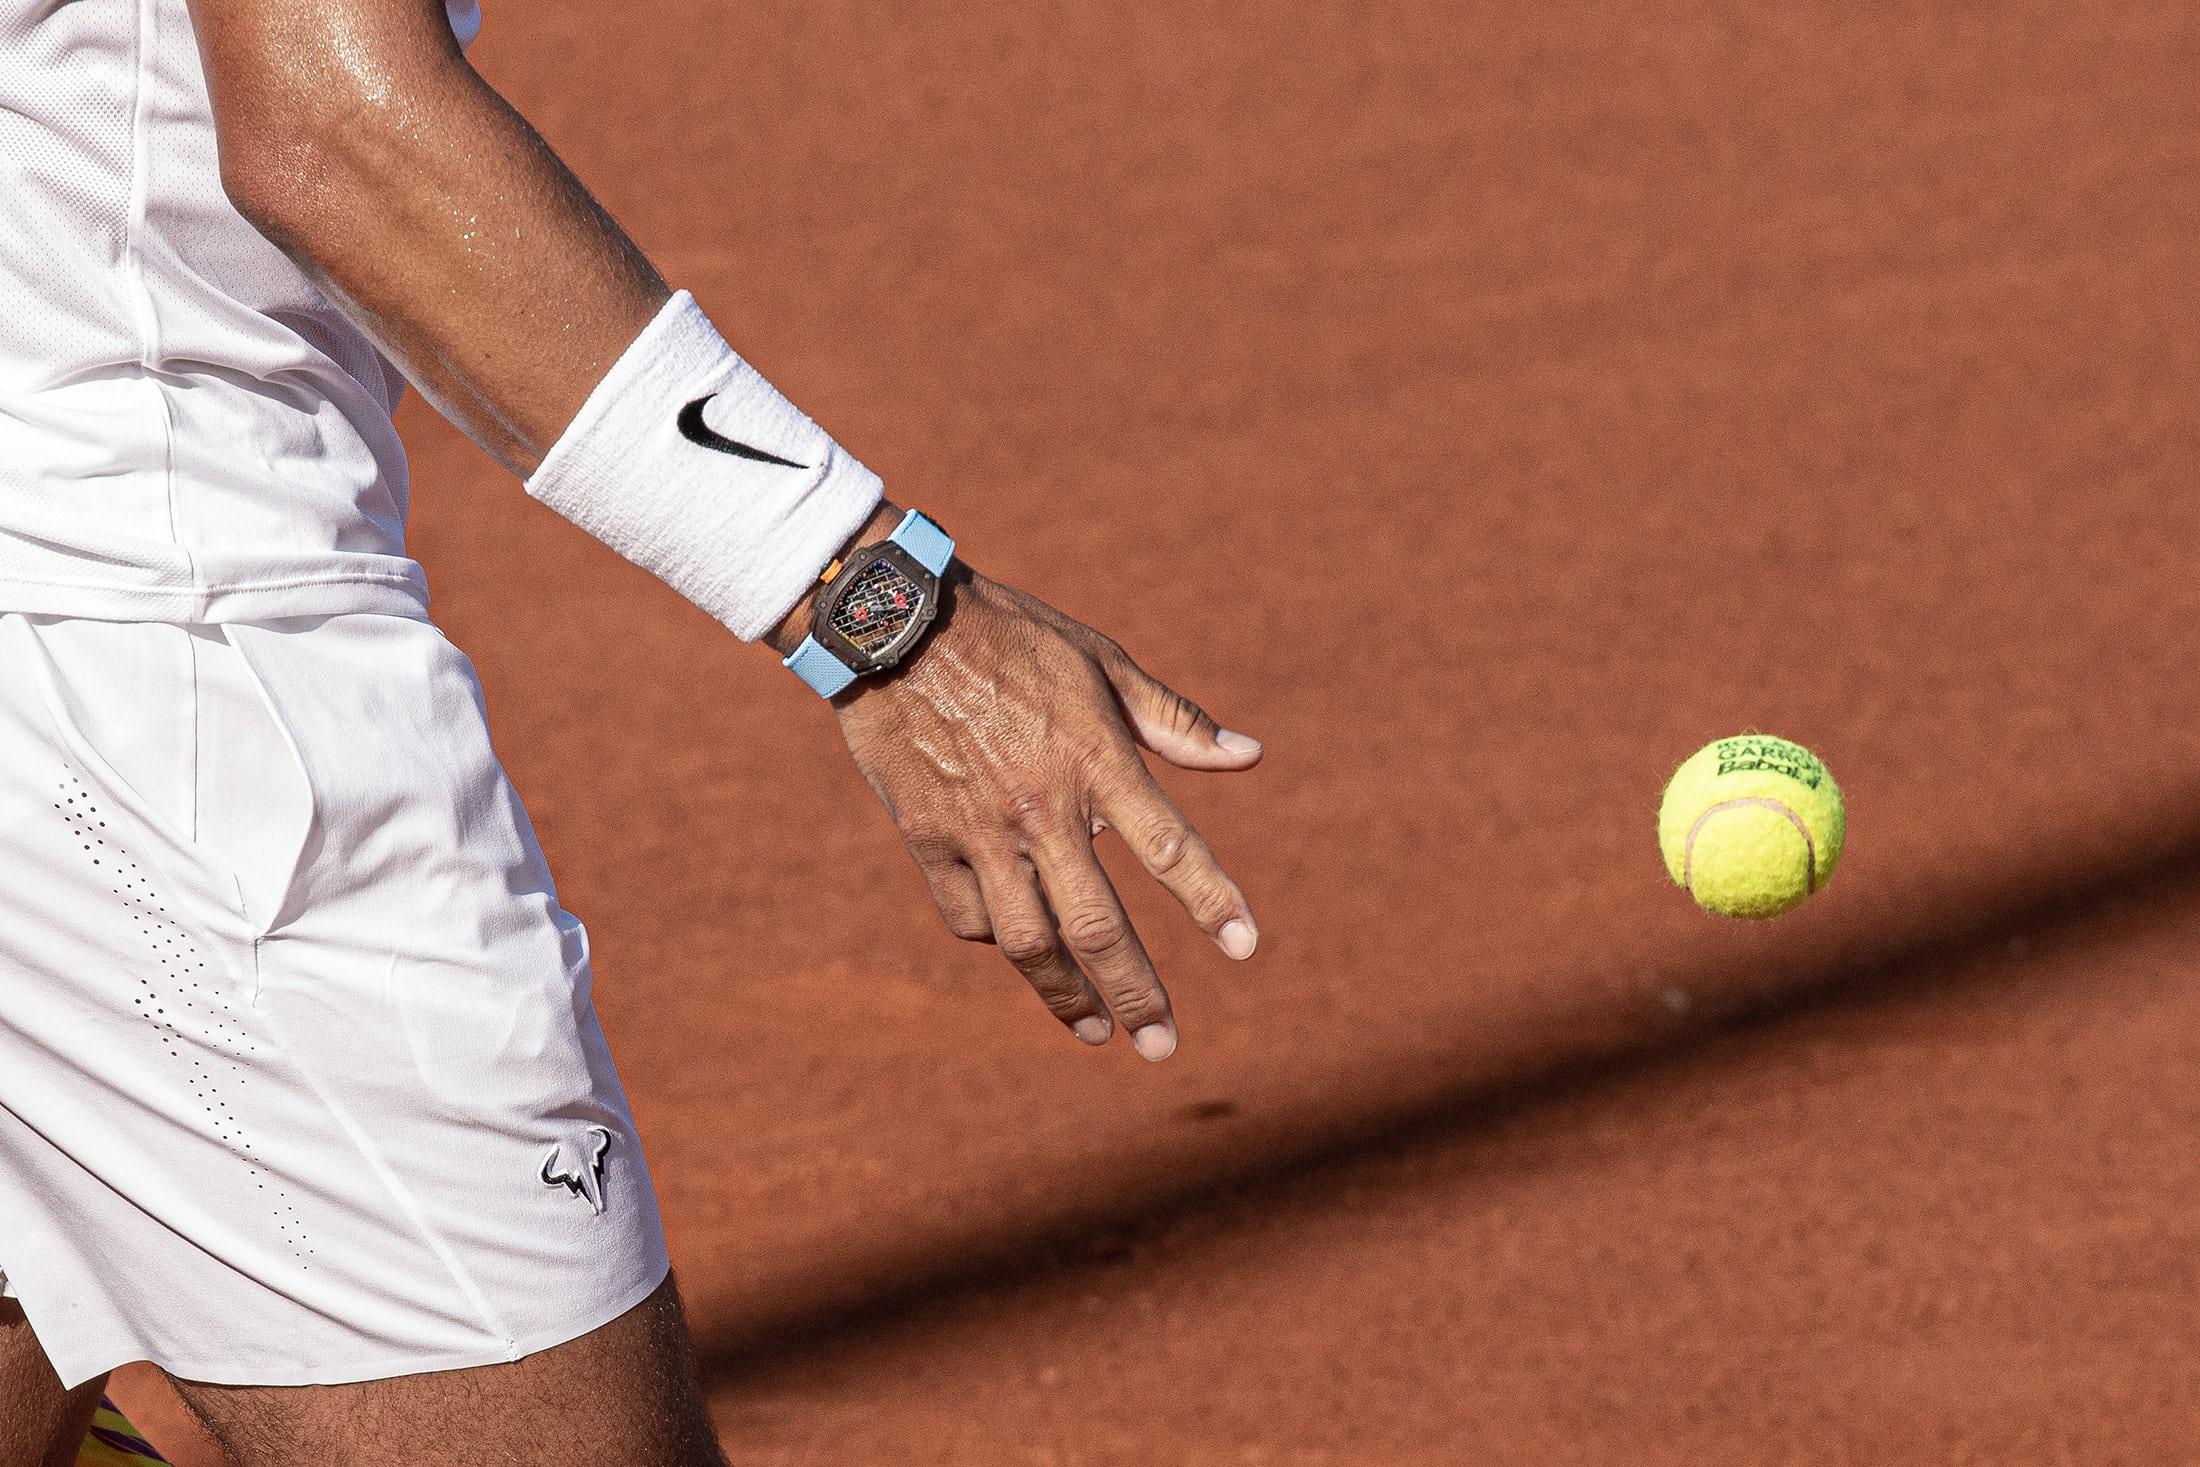 Introducing The Richard Mille Rm 27 04 Tourbillon Rafael Nadal Watch